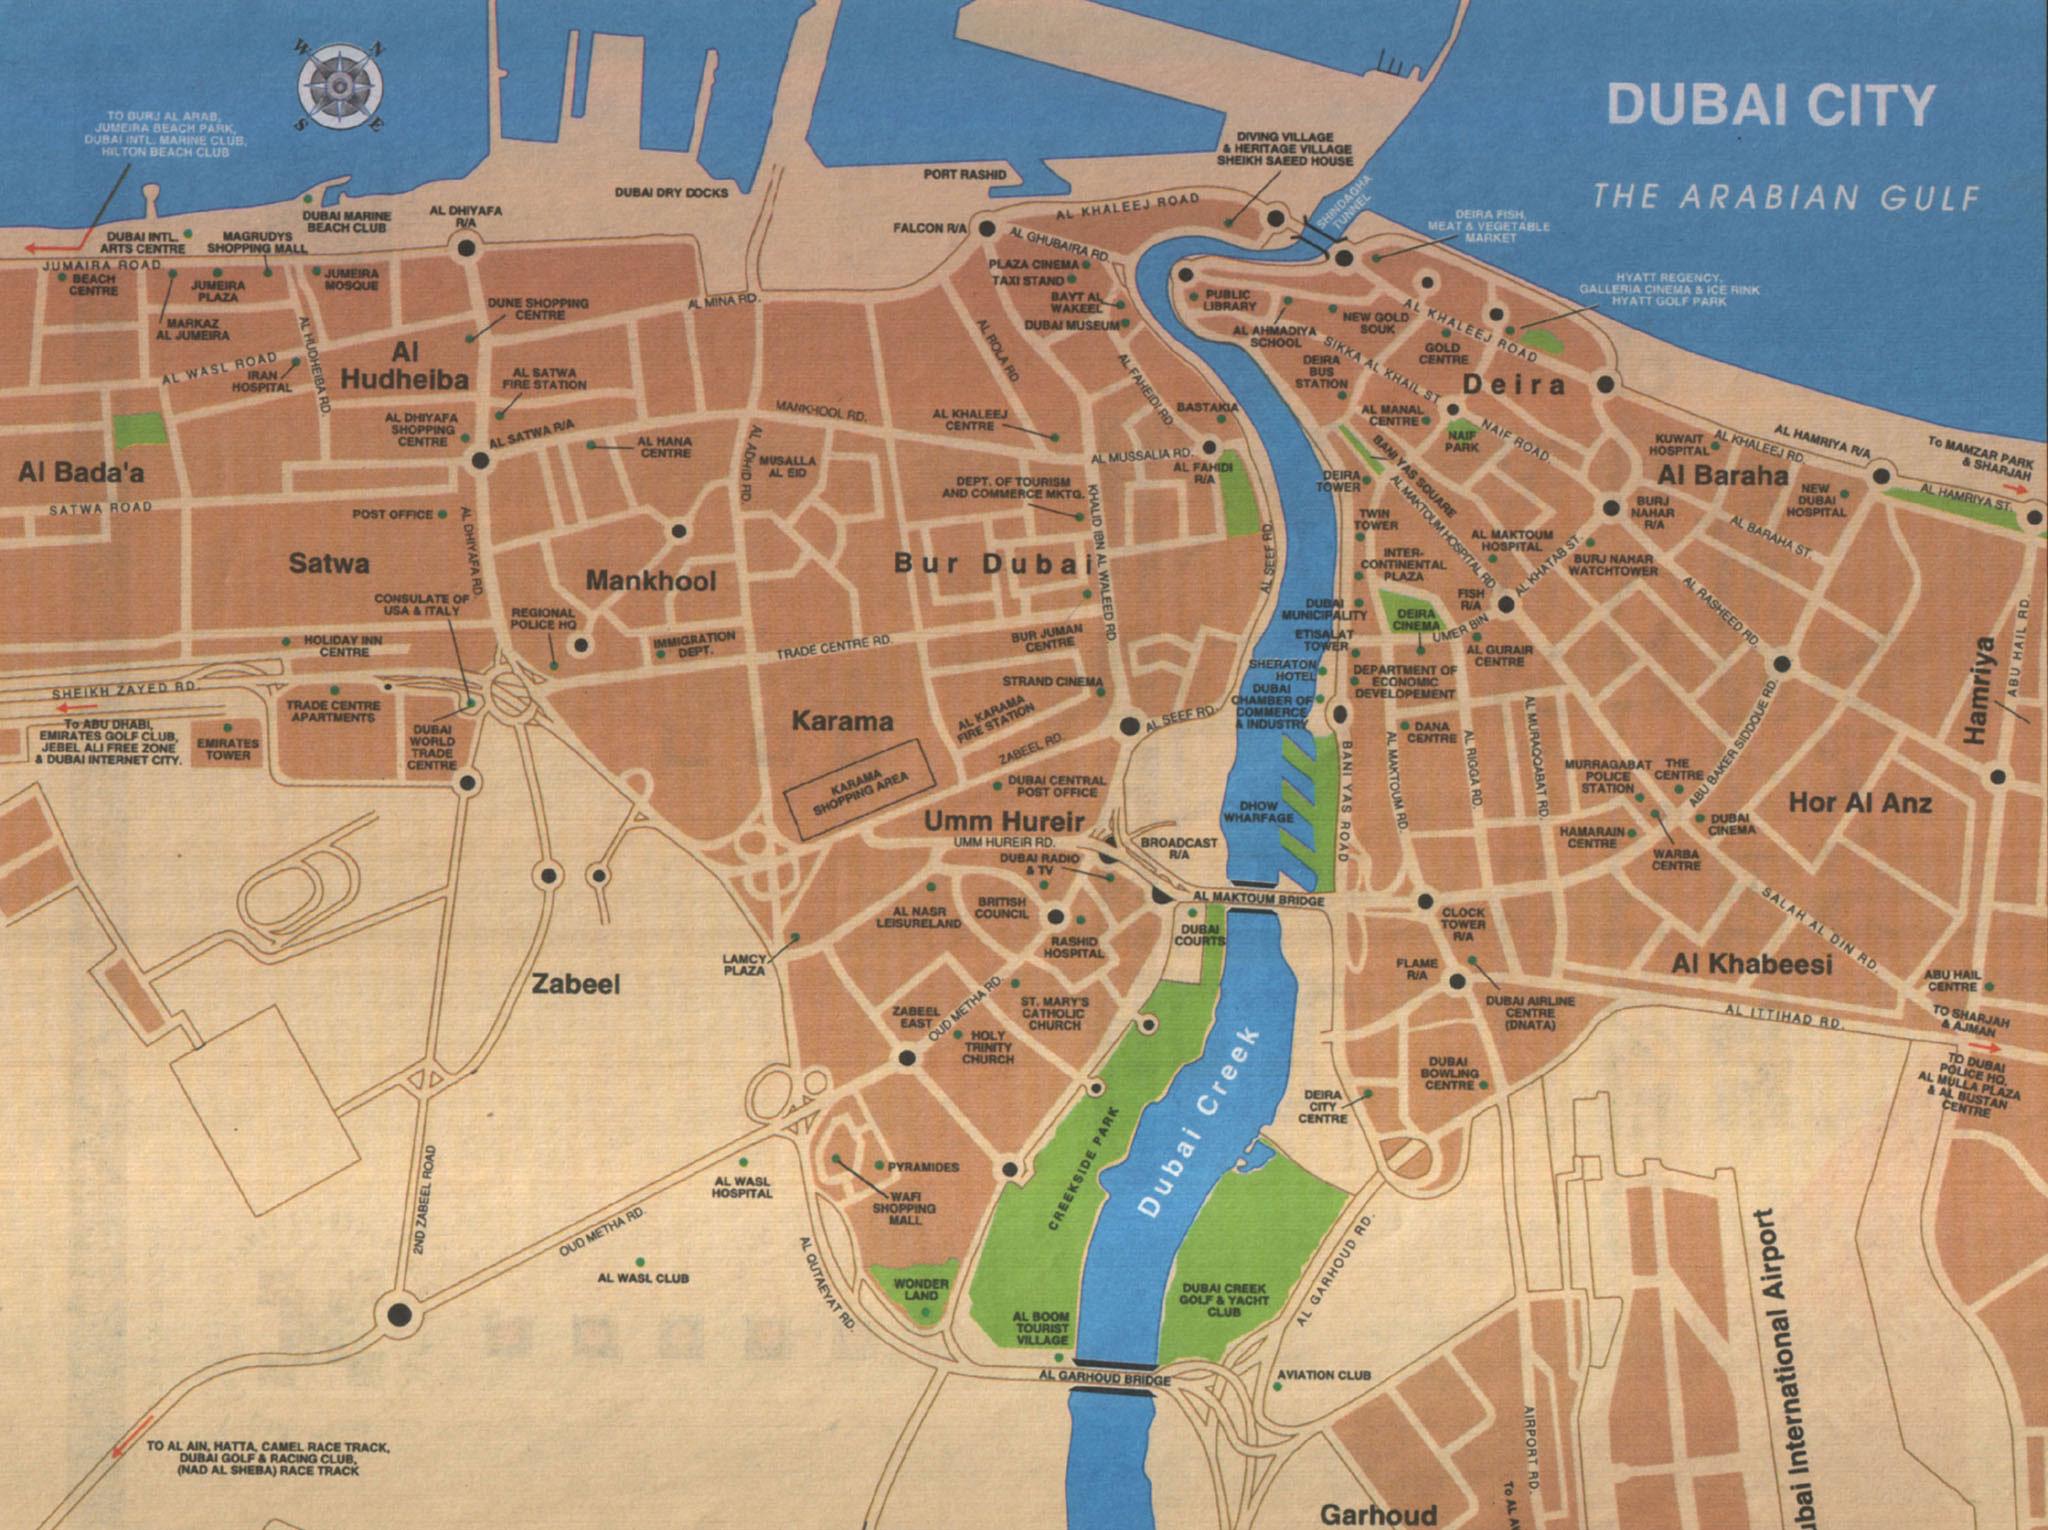 karta över dubai Dubai | Travel Forum karta över dubai